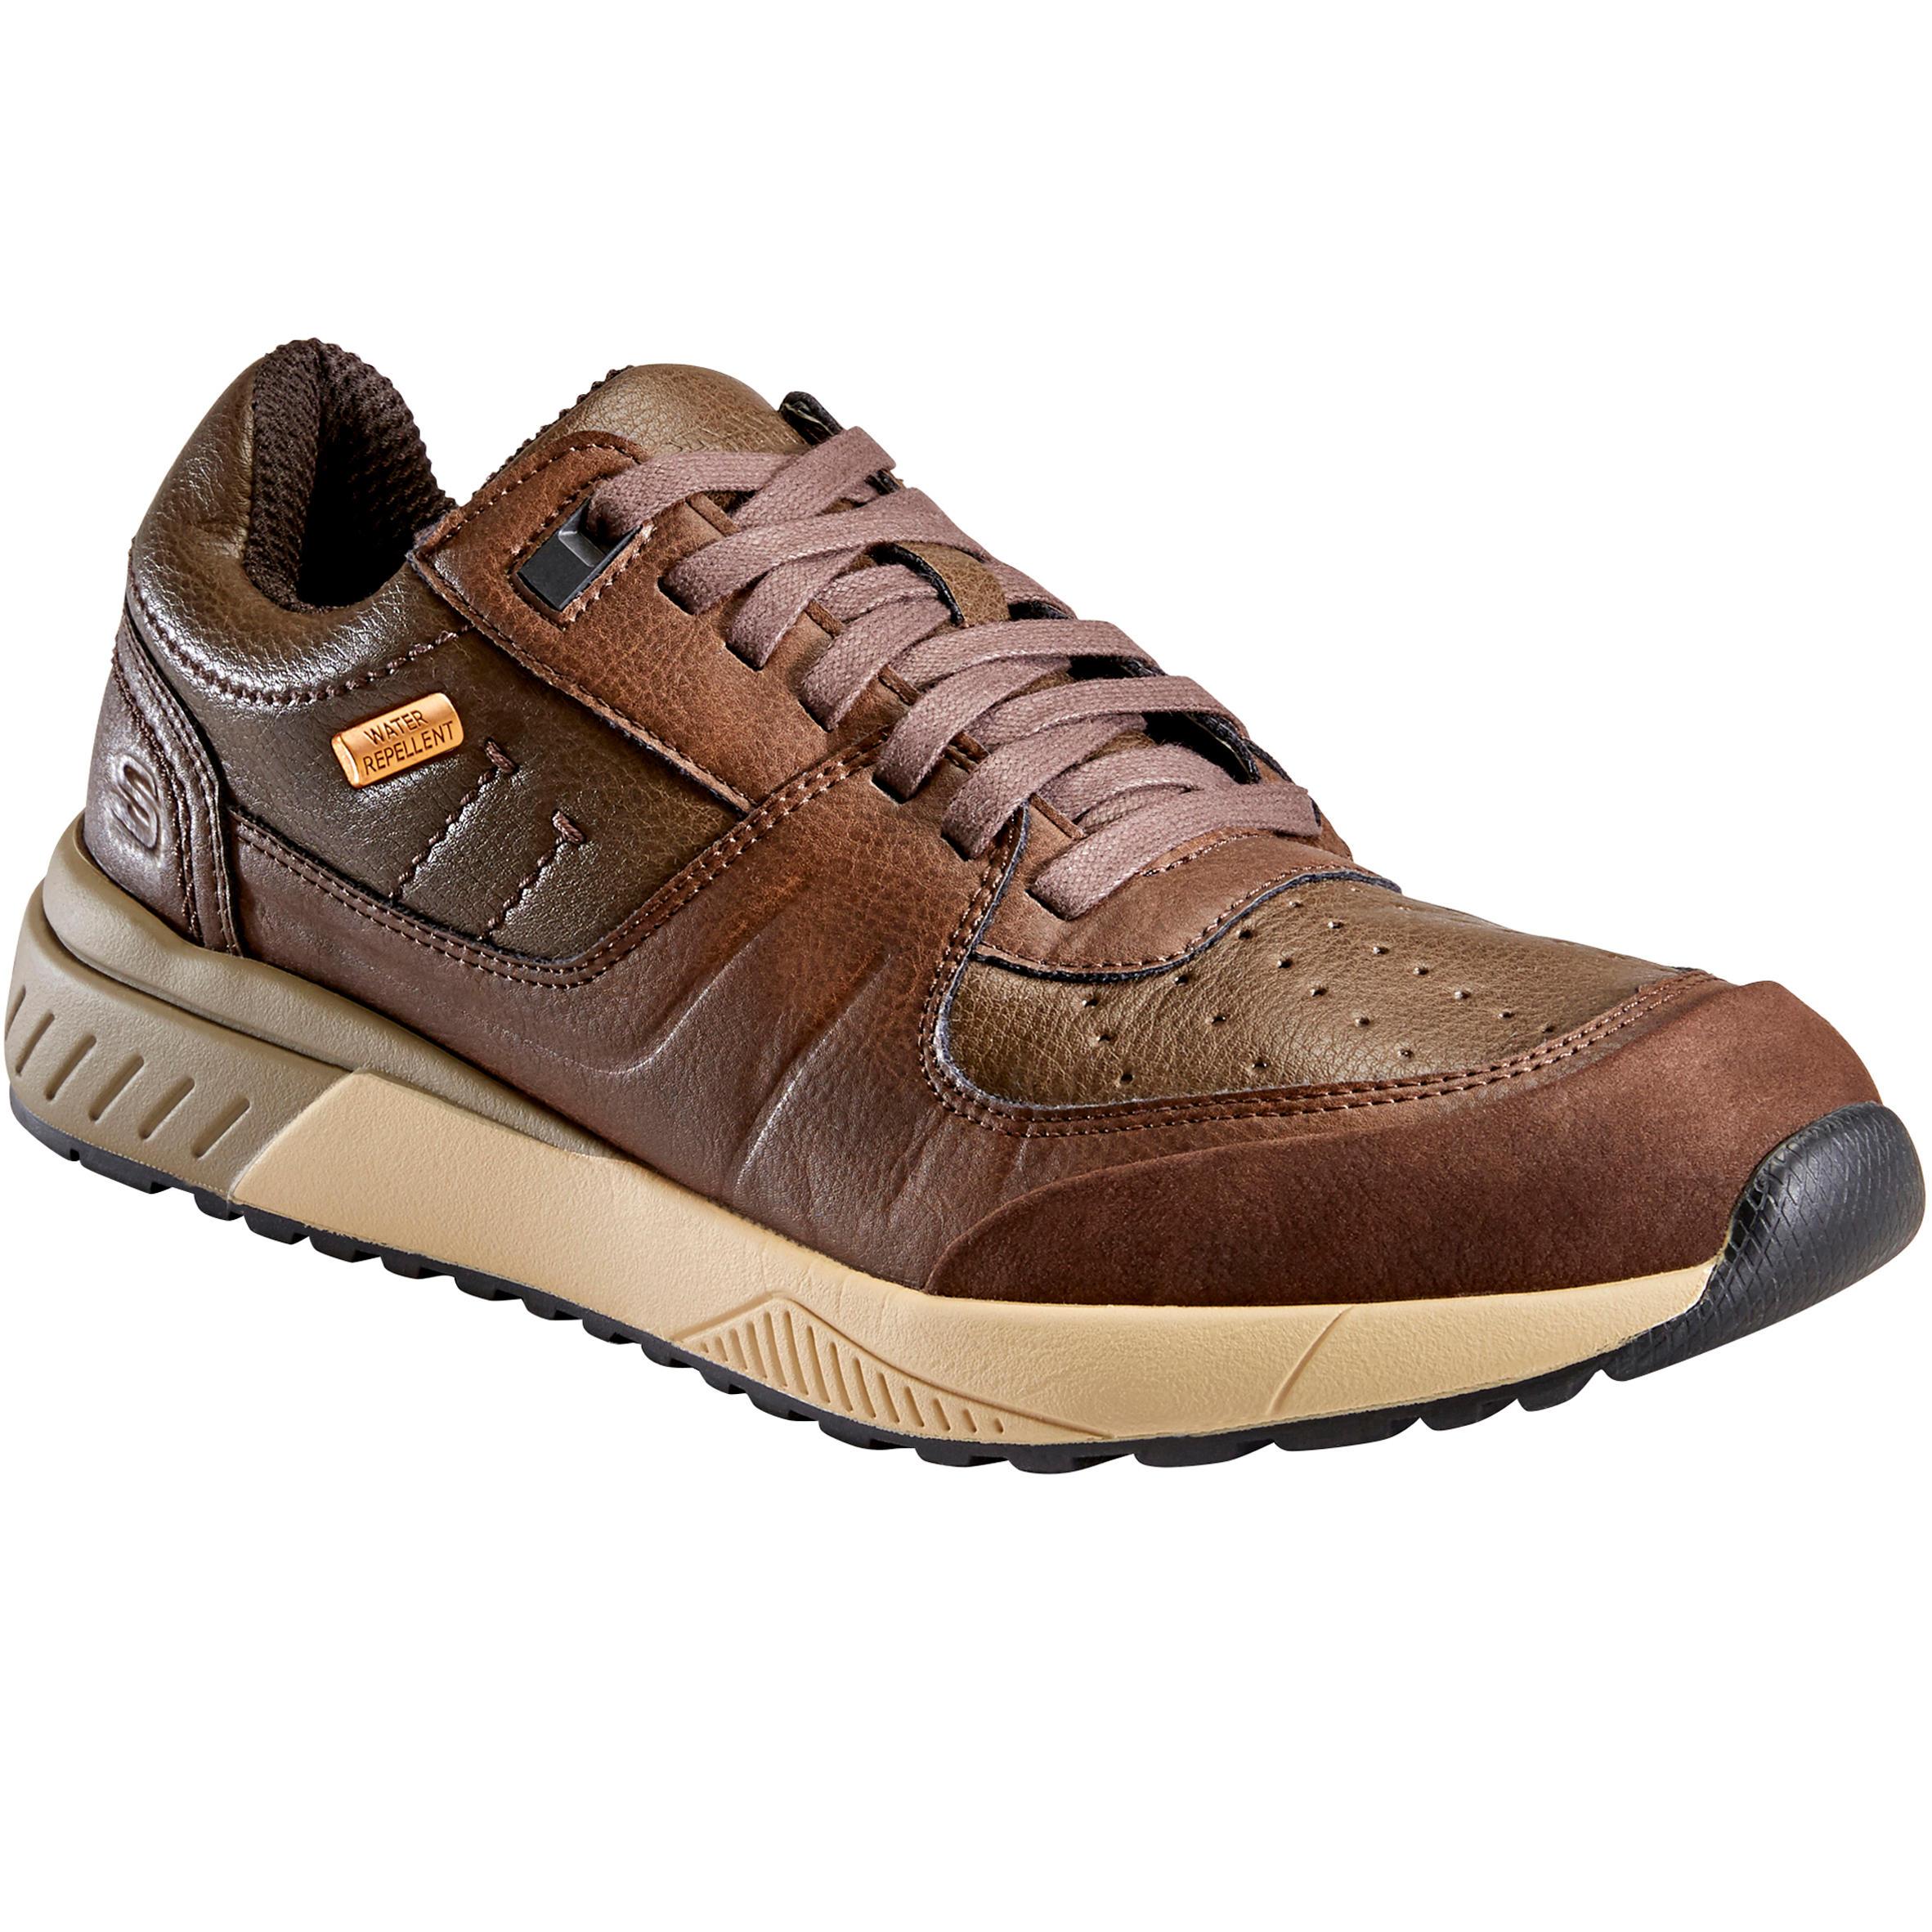 Walkingschuhe Felano Herren braun | Schuhe > Sportschuhe > Walkingschuhe | Skechers